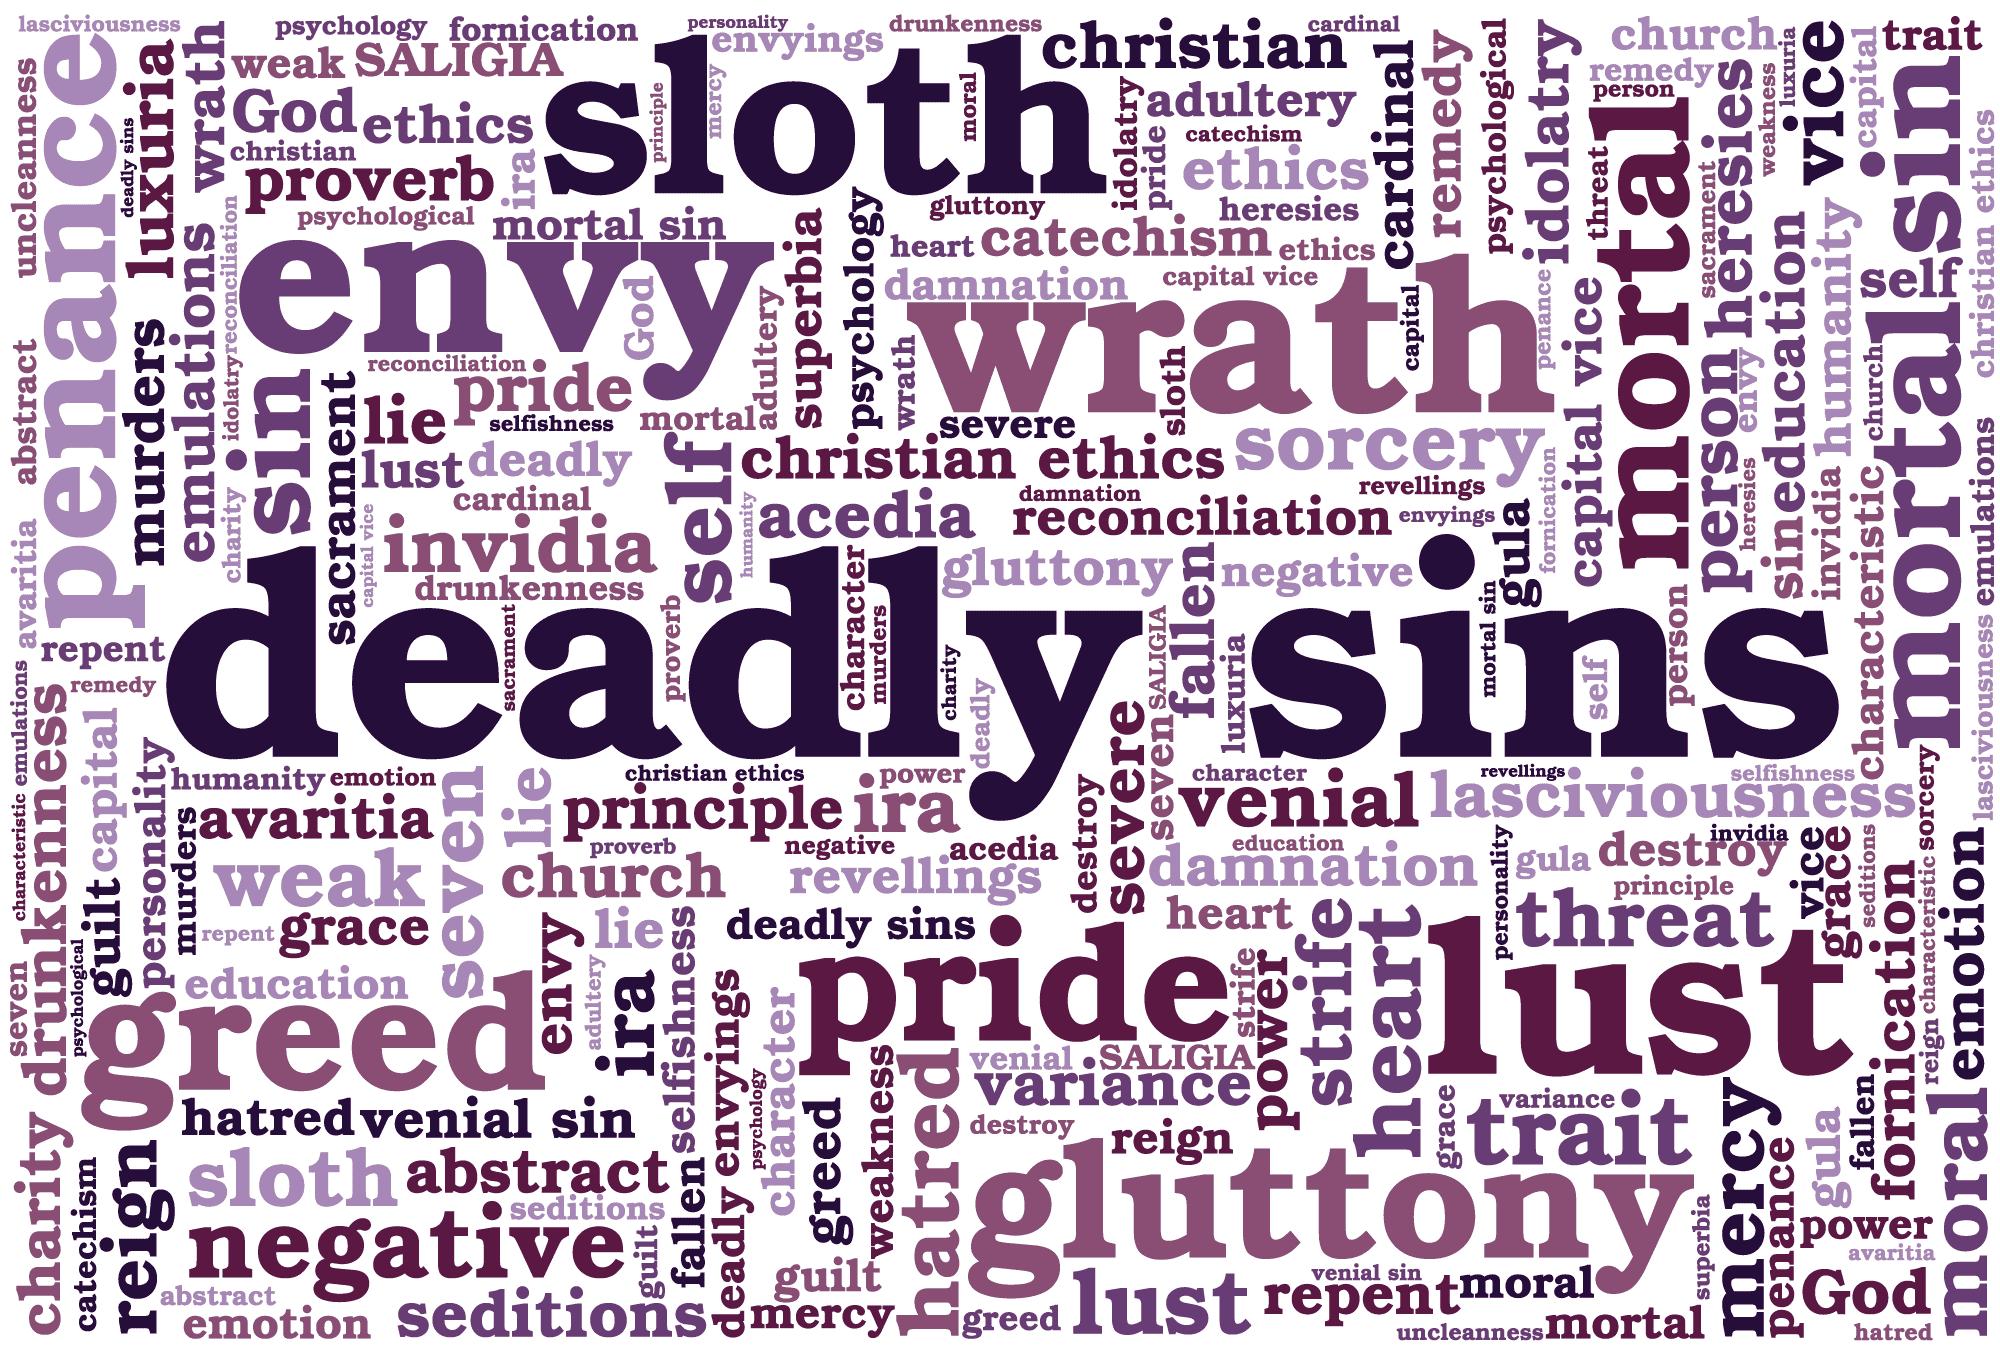 Seven Deadly Sins Symbols List, A Word Cloud for Seven Cardinal Sins